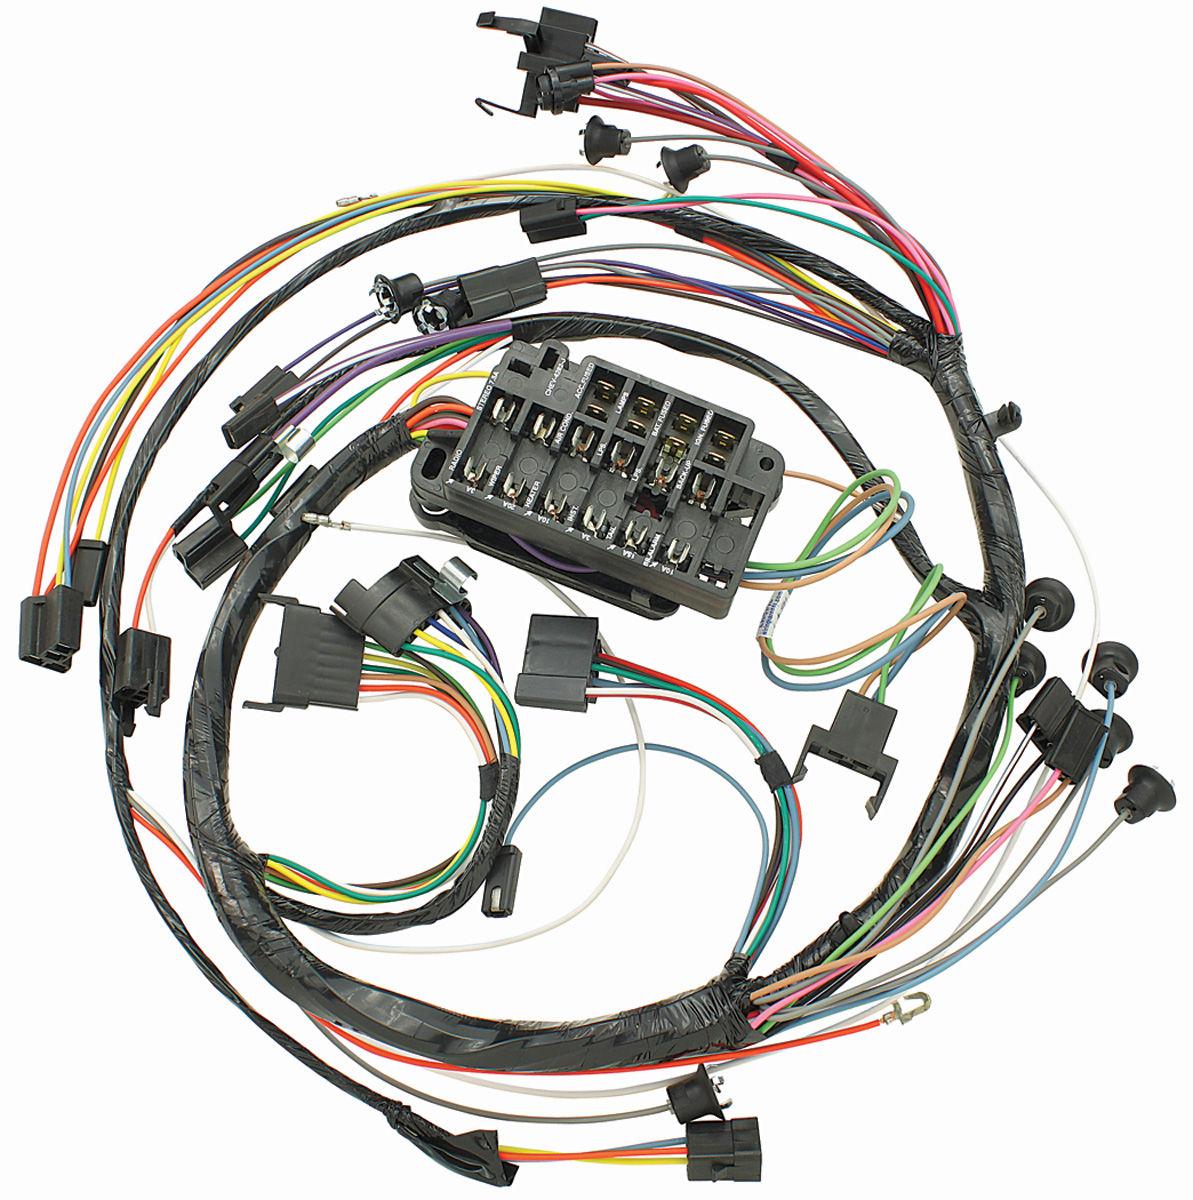 [SCHEMATICS_4US]  Wiring Harness, Dash, 1966 Chevelle/El Camino, Gauges/Console @ OPGI.com | 1966 El Camino Wiring Harness |  | Original Parts Group